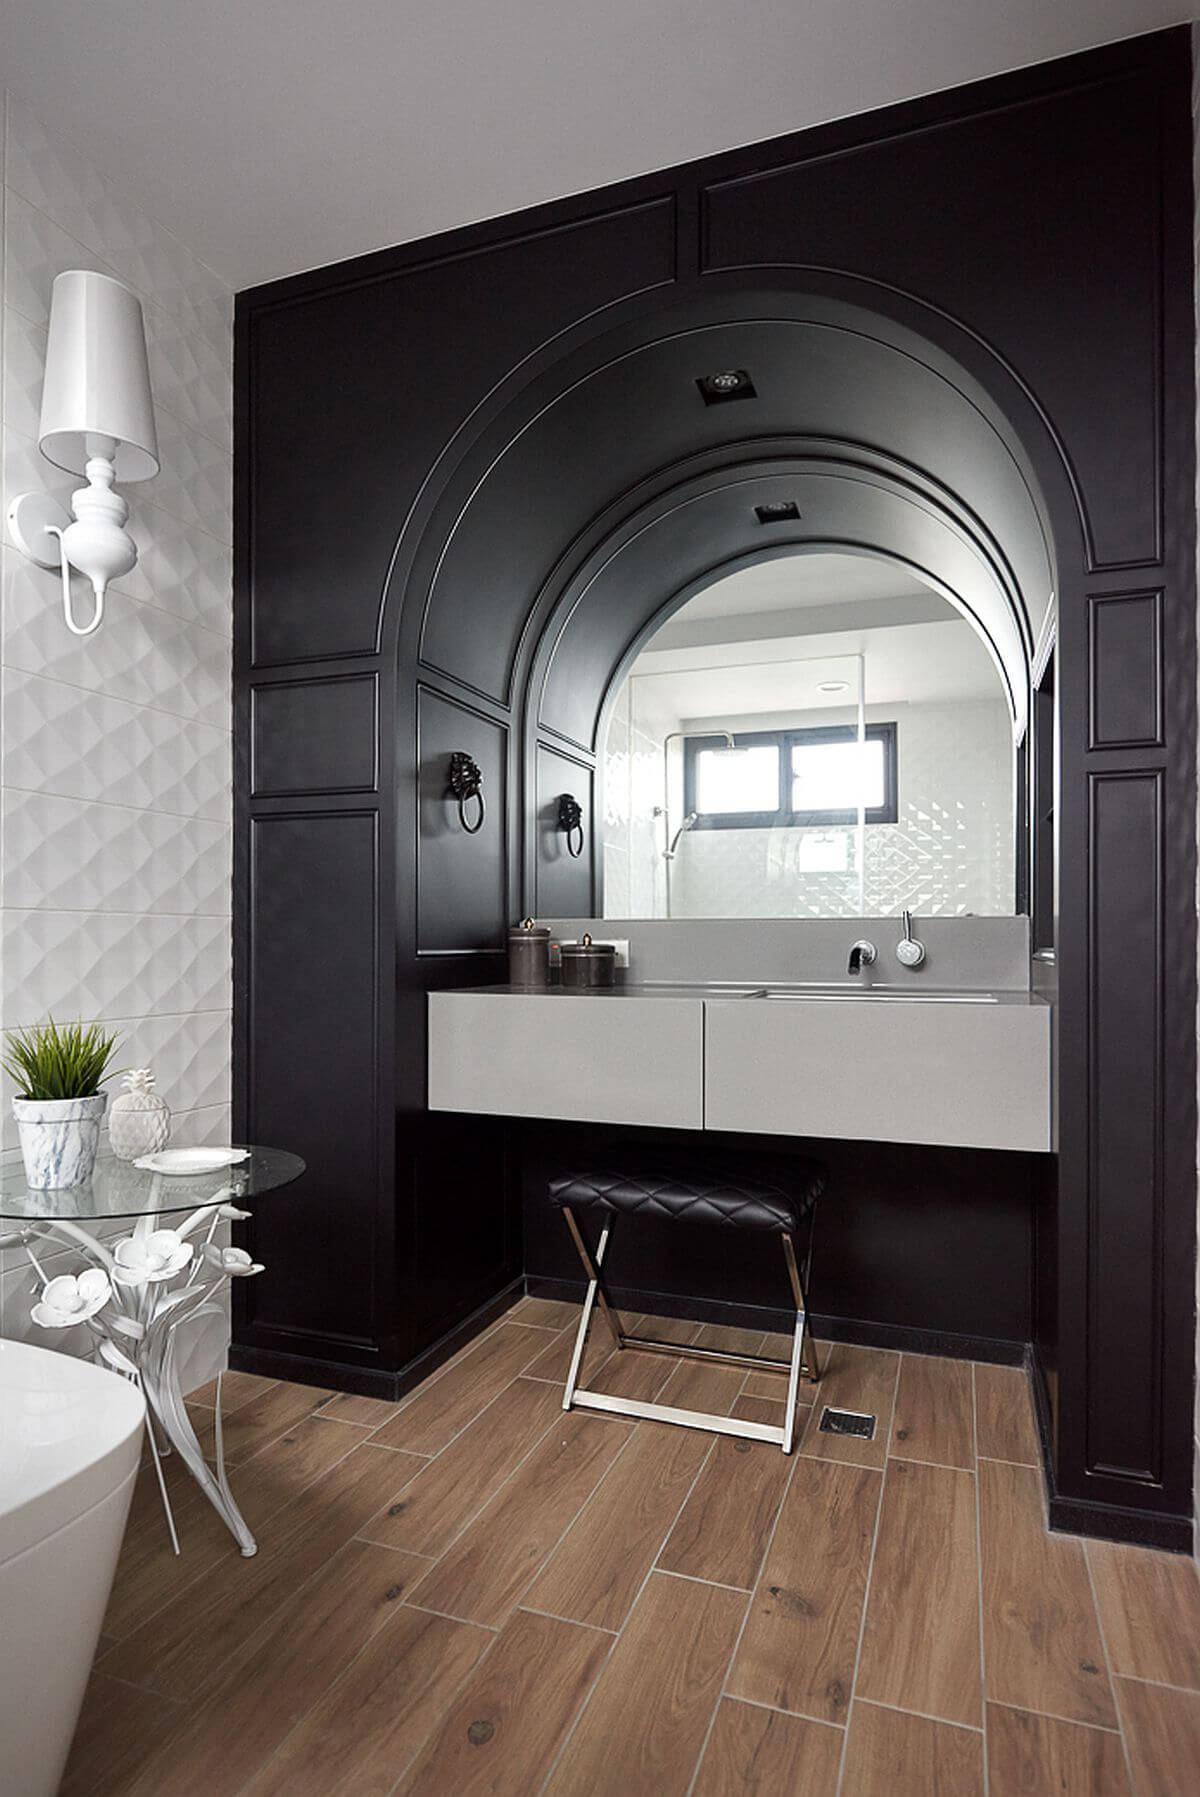 adelaparvu.com despre apartament in stil clasic reinterpretat, 165 mp, design HAO Design, Foto HeyCheese (26)